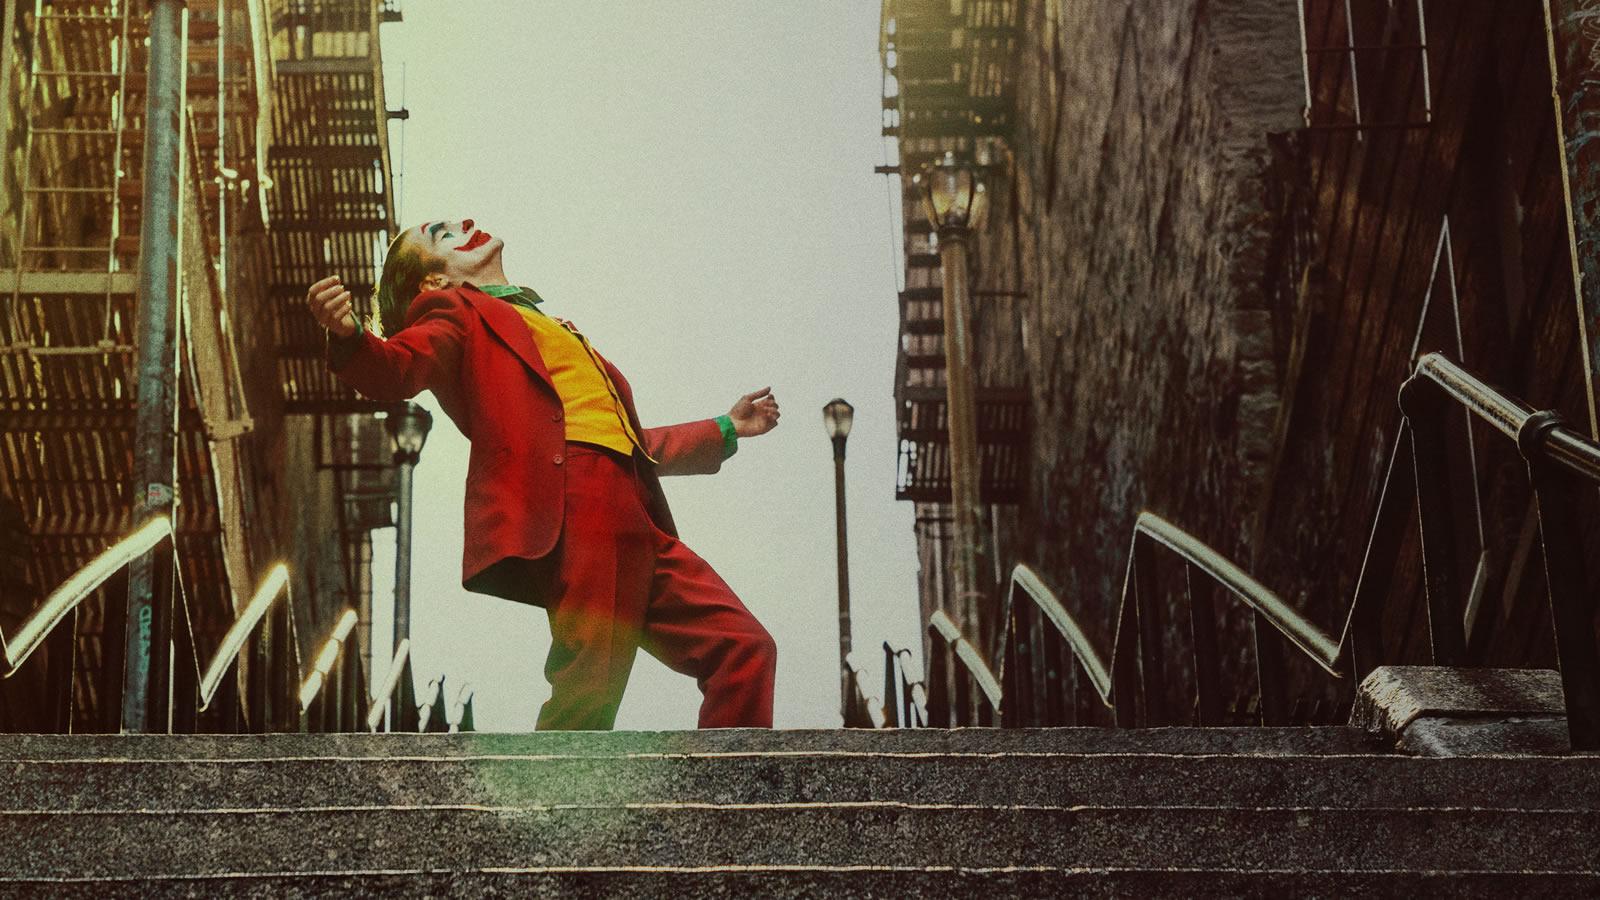 Joker: A Violent, Noxious Scorsese Rip-Off